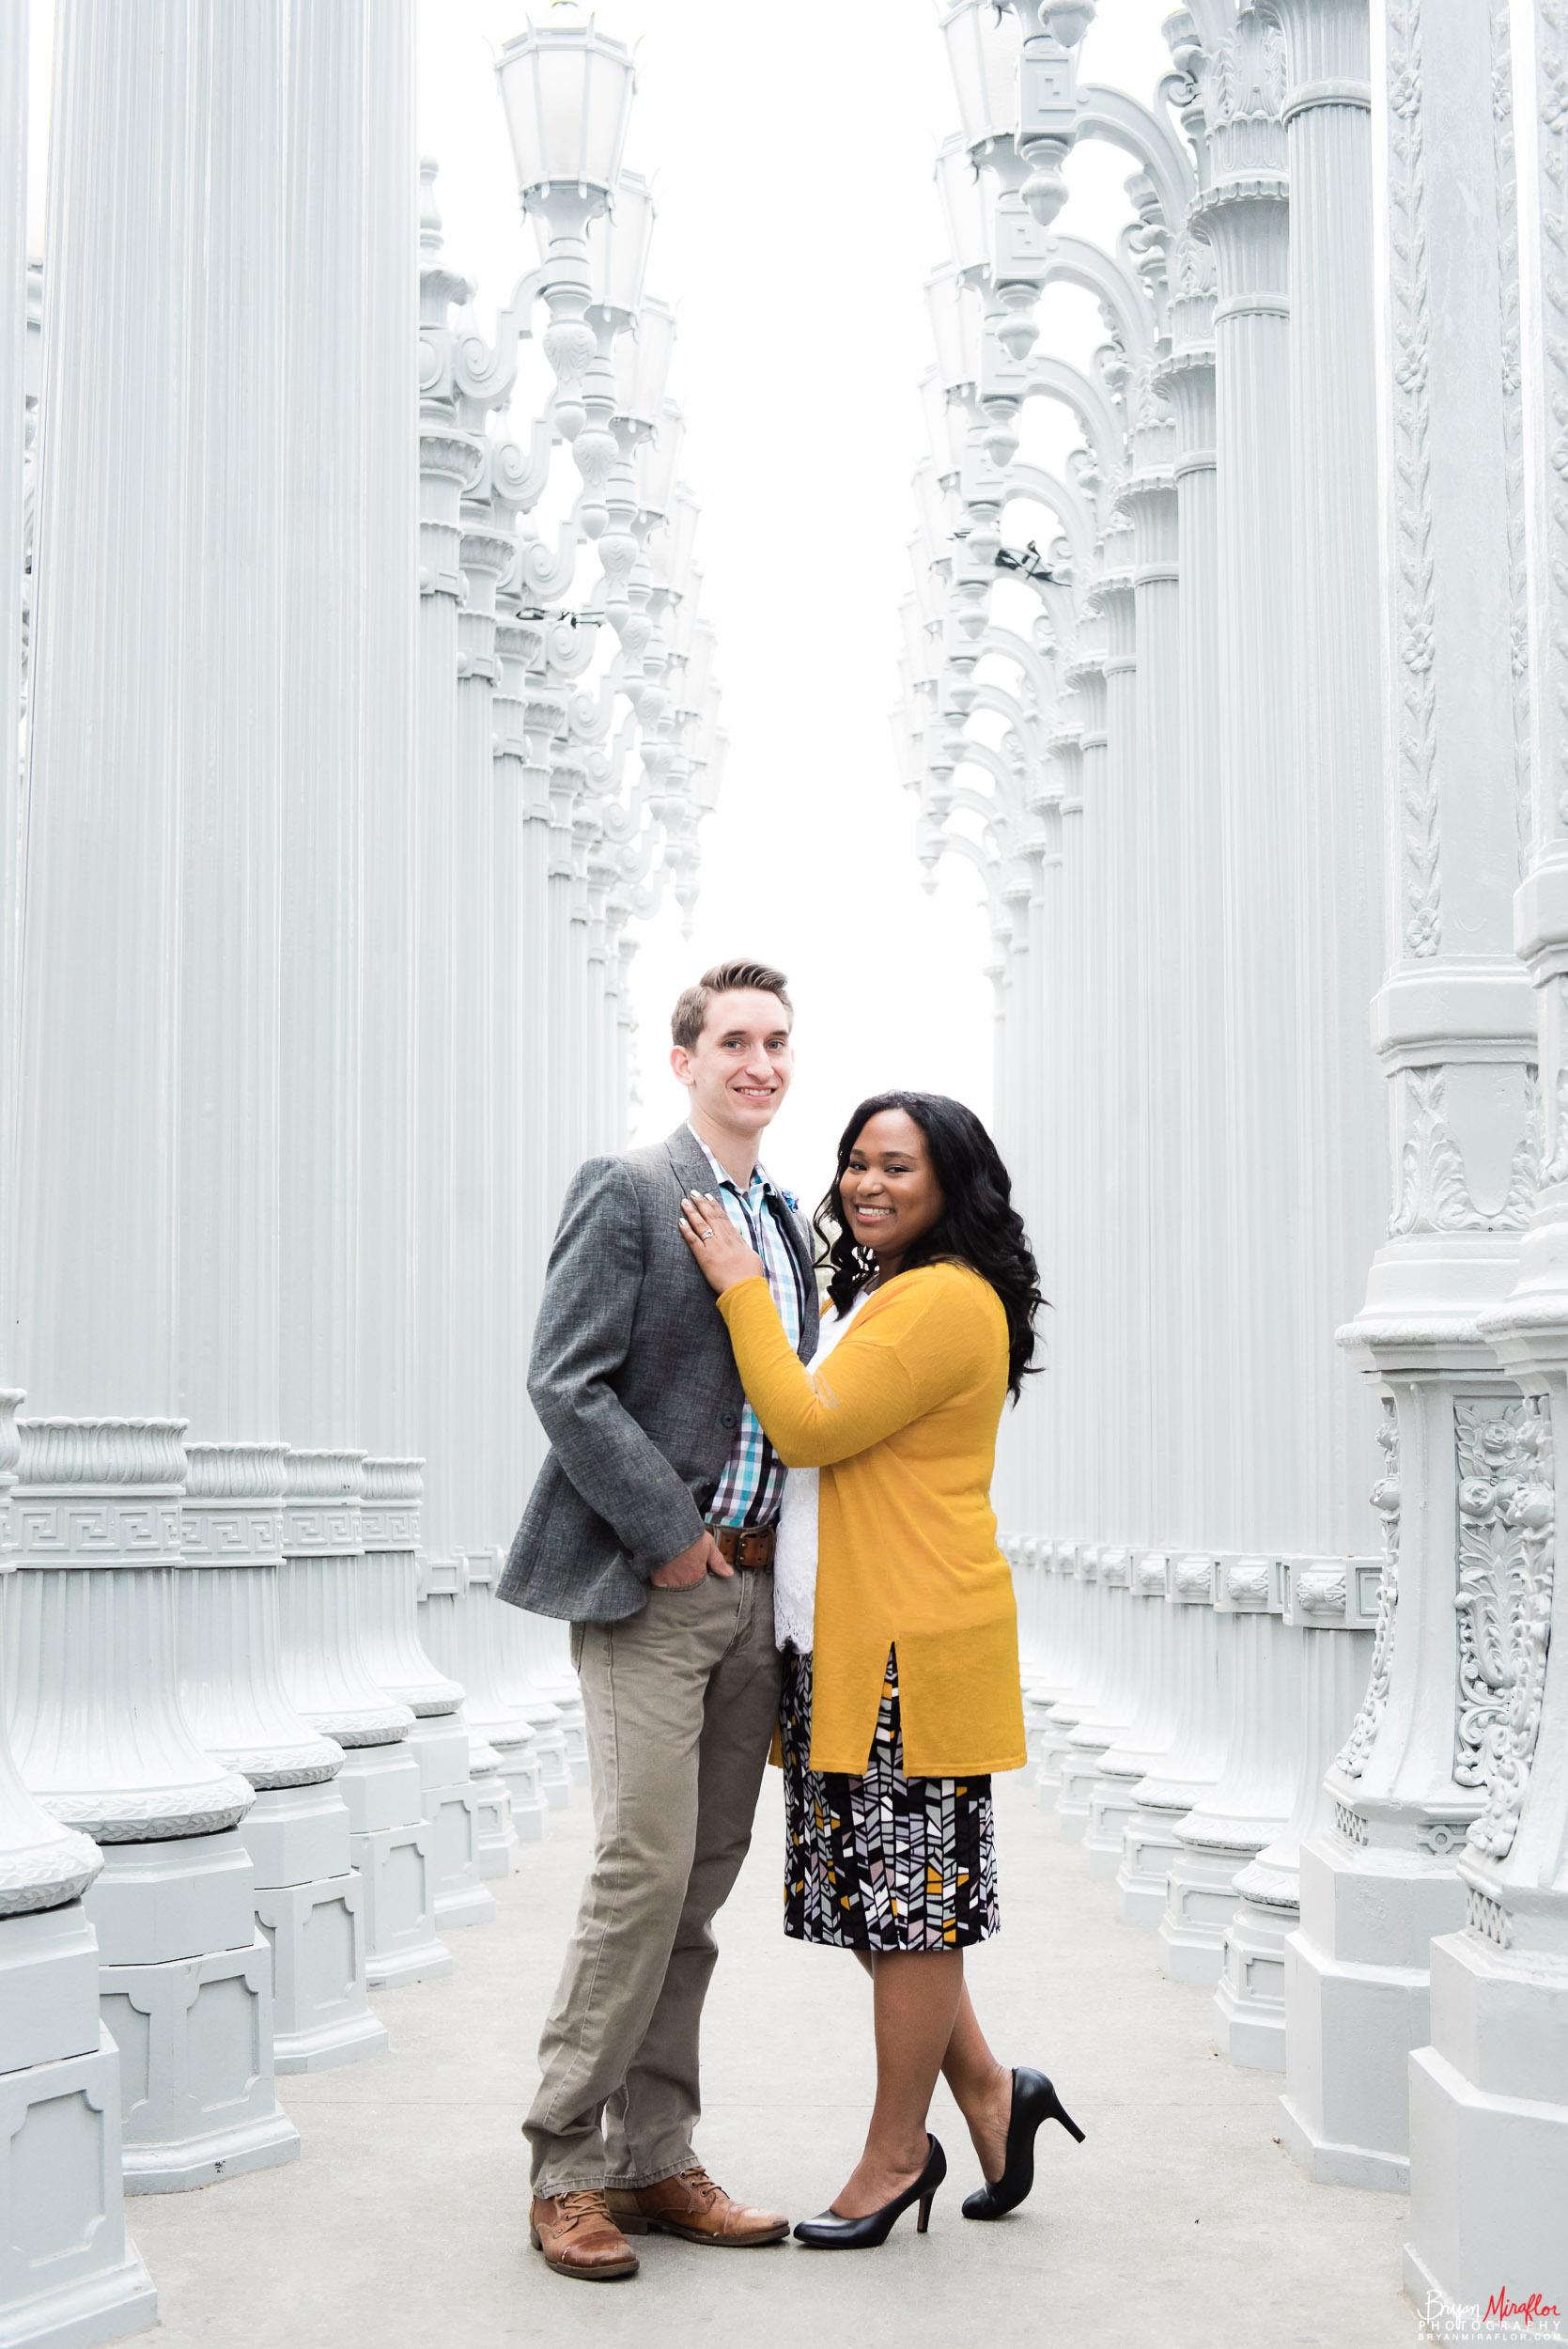 Bryan-Miraflor-Photography-Vanessa-Tommy-LACMA-DTLA-Engagement-Photoshoot-20161210-77.jpg